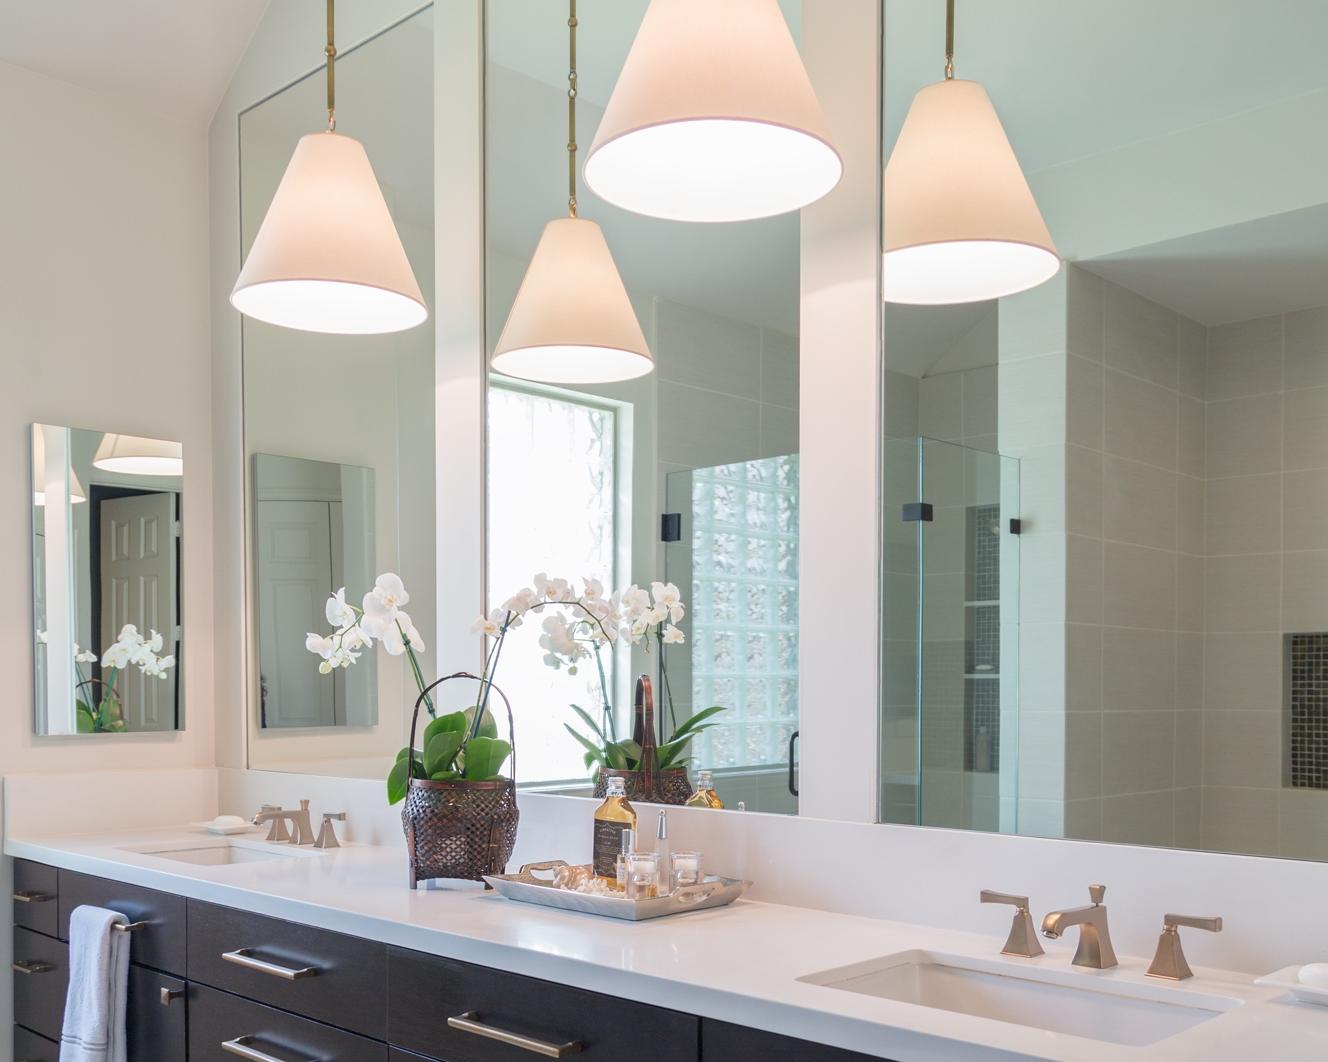 Bathroom designed by Carla Aston /Photo by Tori Aston